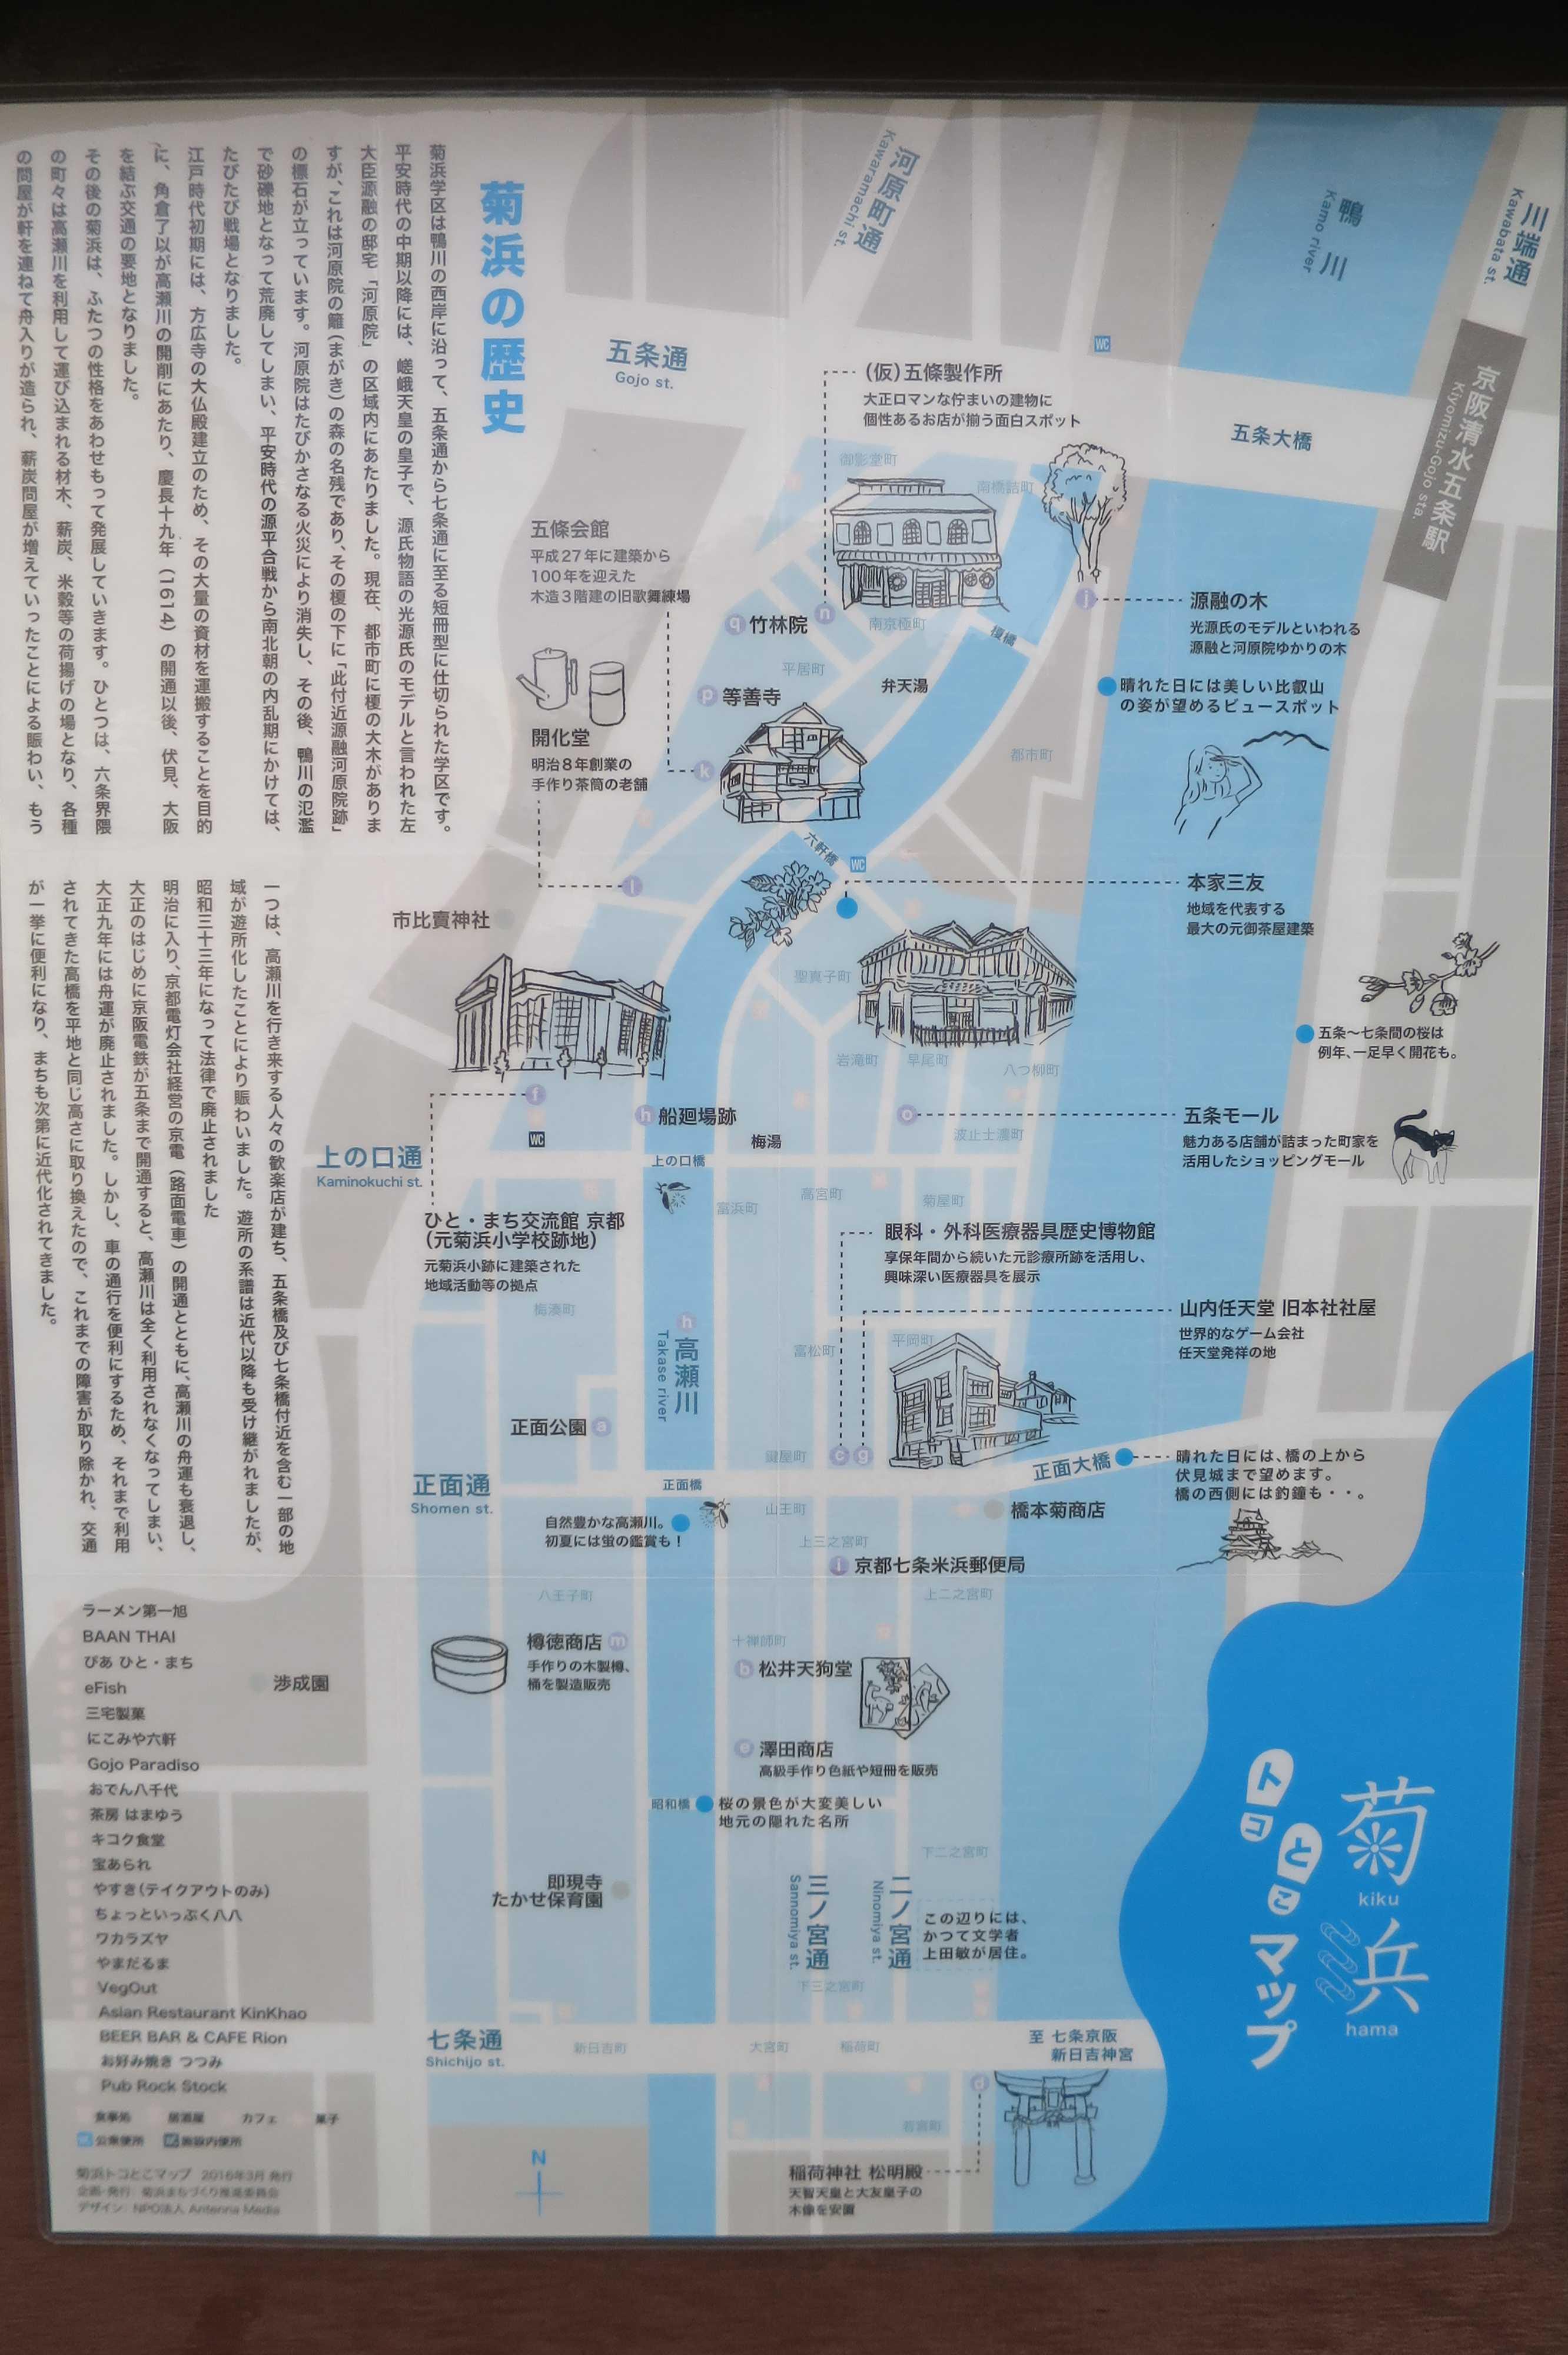 京都・五条楽園 - 菊浜学区の地図